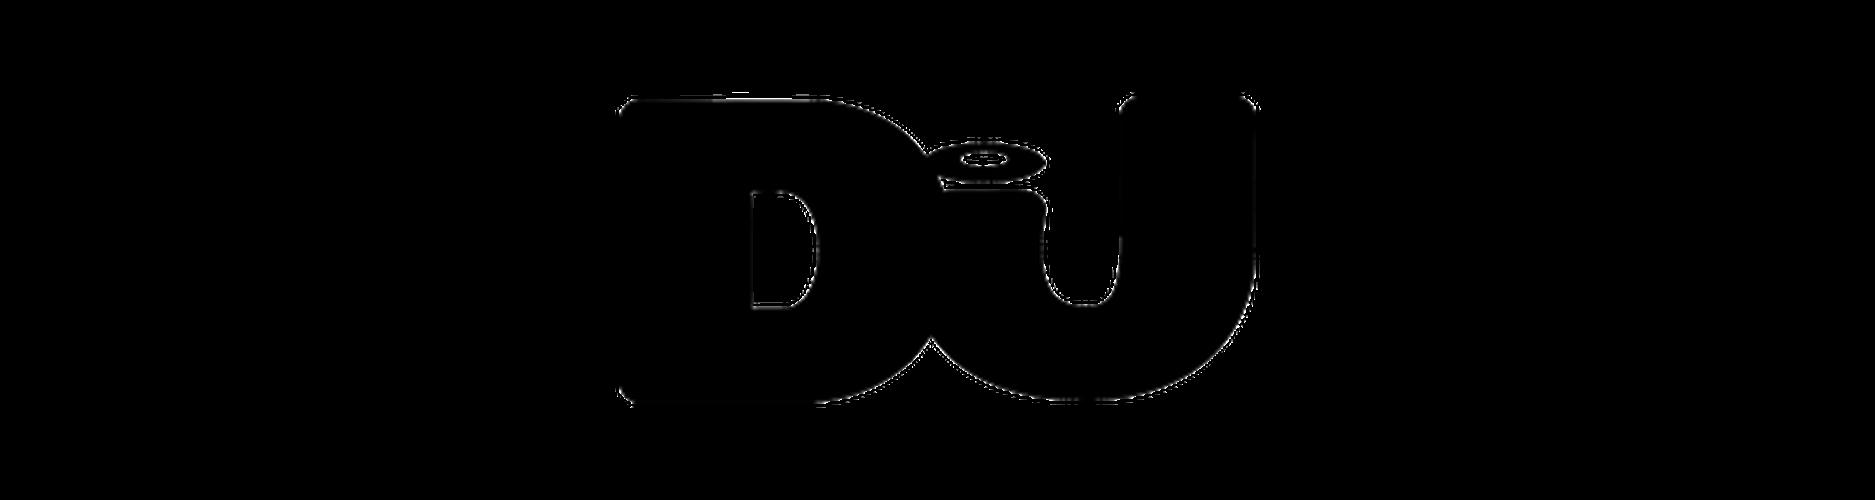 DJ Mag